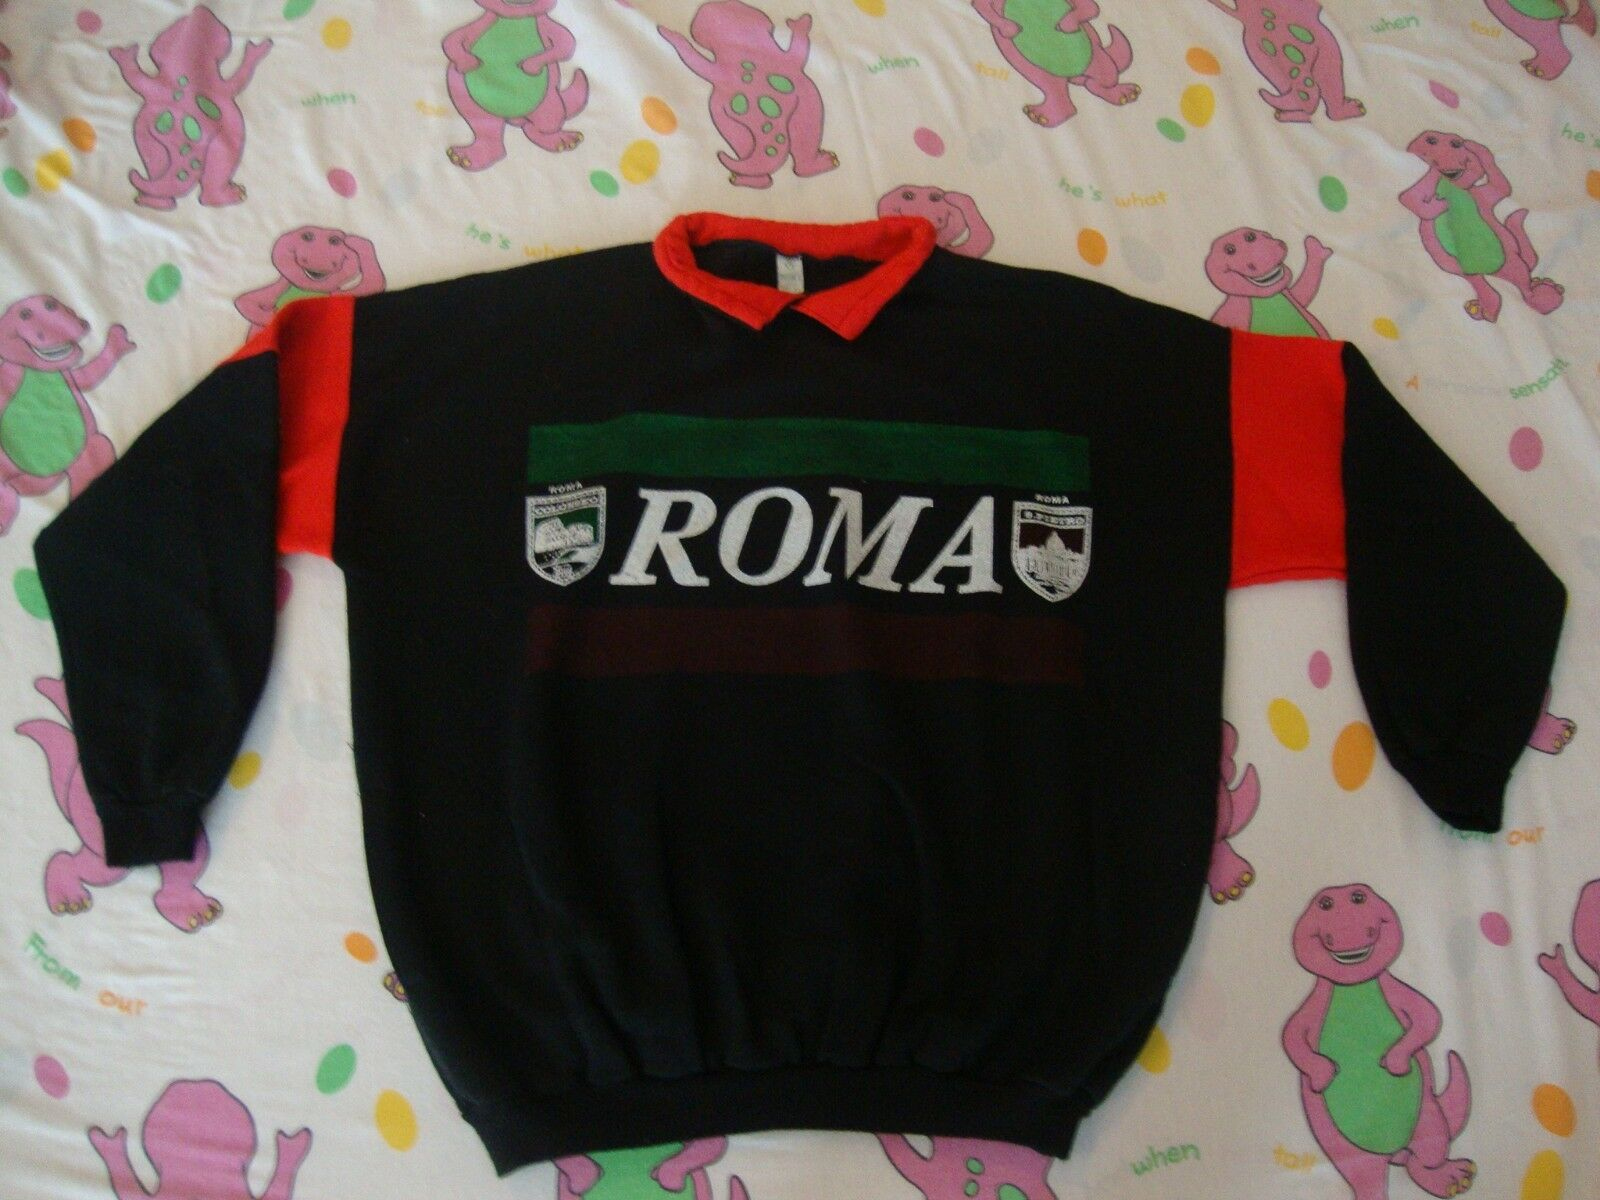 Vintage ROMA Colosseo S. Pietro  Rap Hip Hop Collar Sweatshirt XL